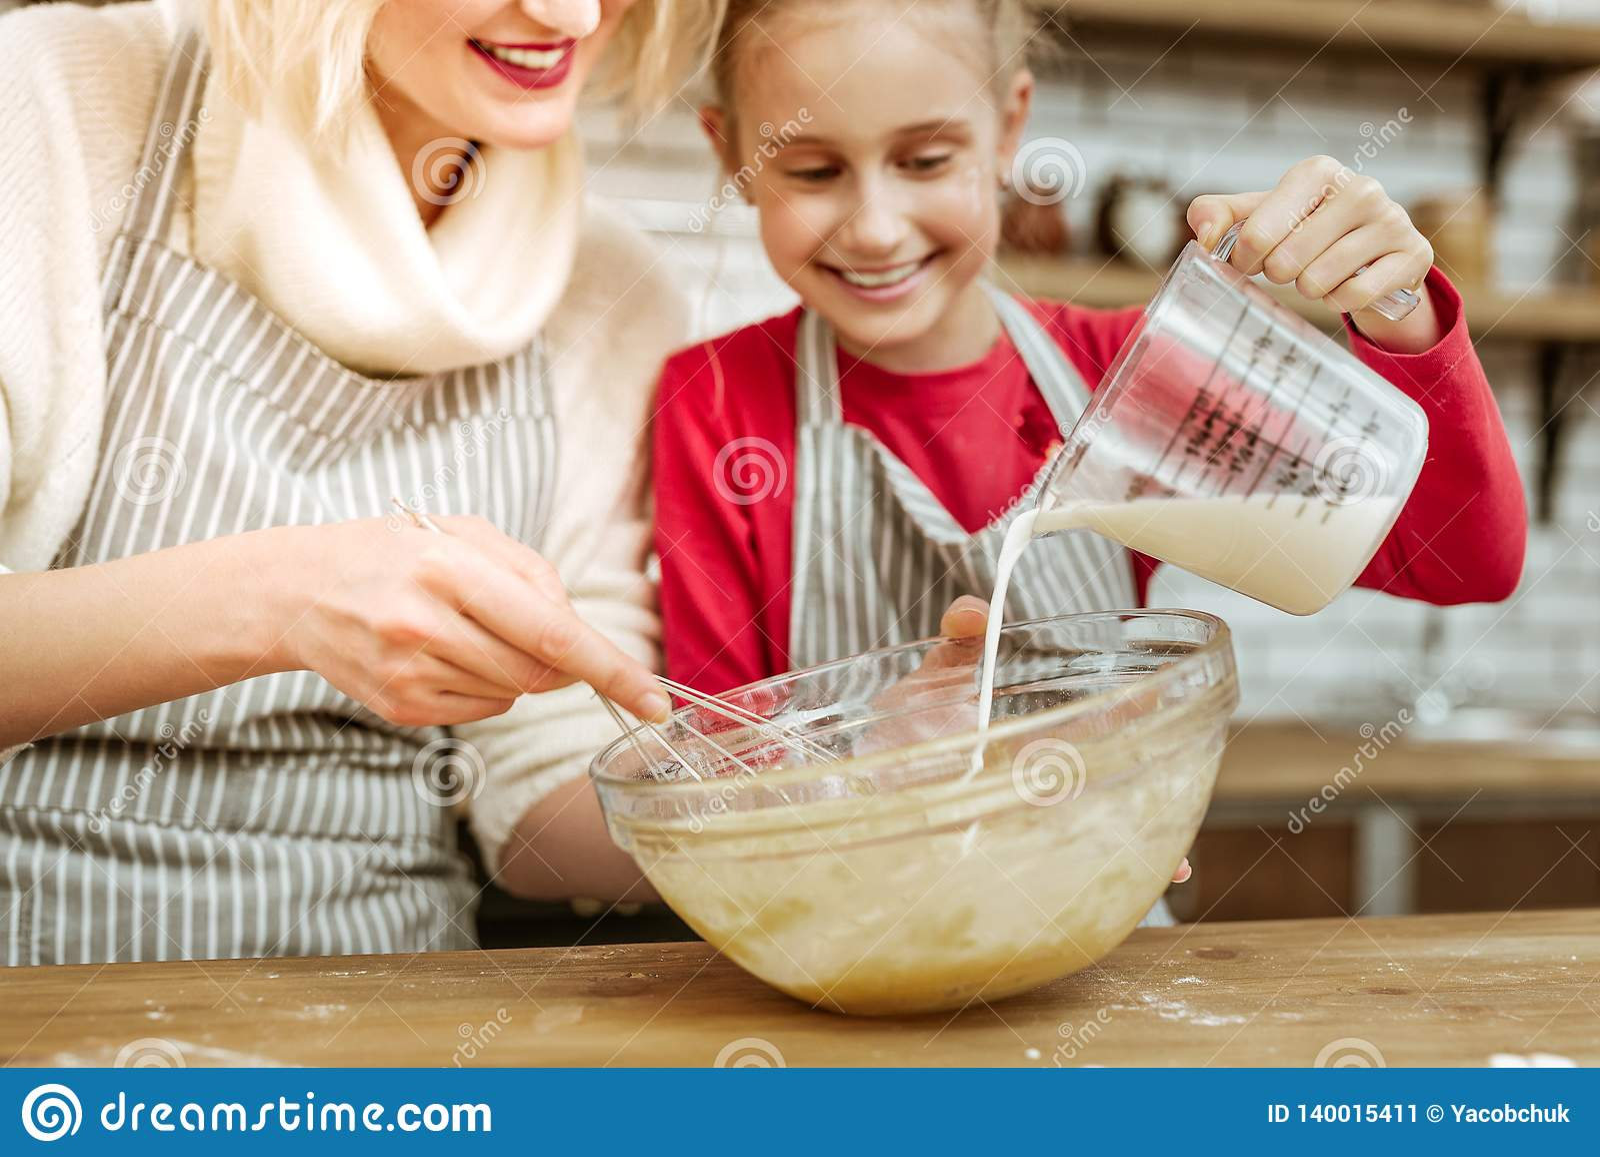 Happy Joyful Little Kid Adding Milk From Measuring Cup